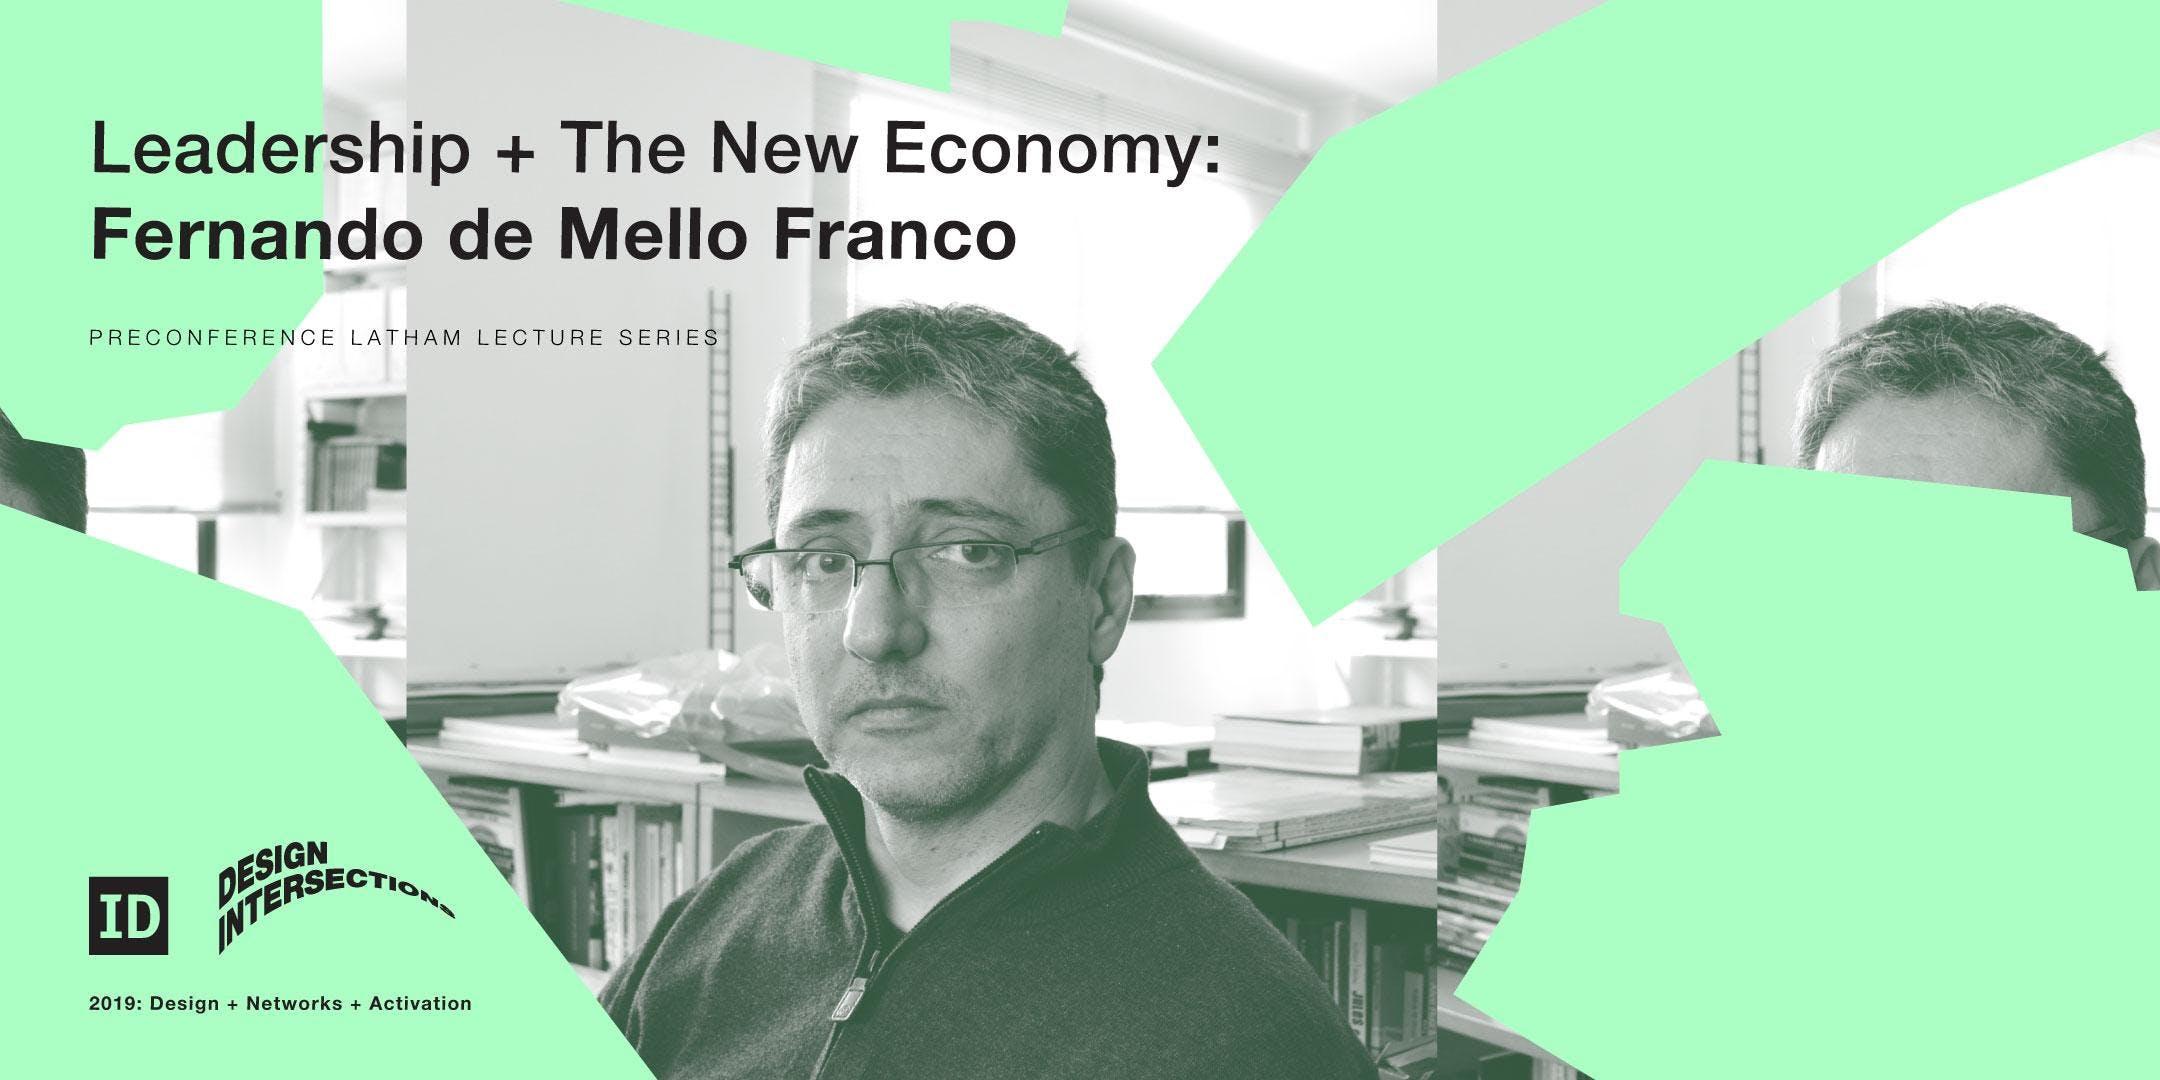 Leadership + The New Economy: Fernando de Mello Franco